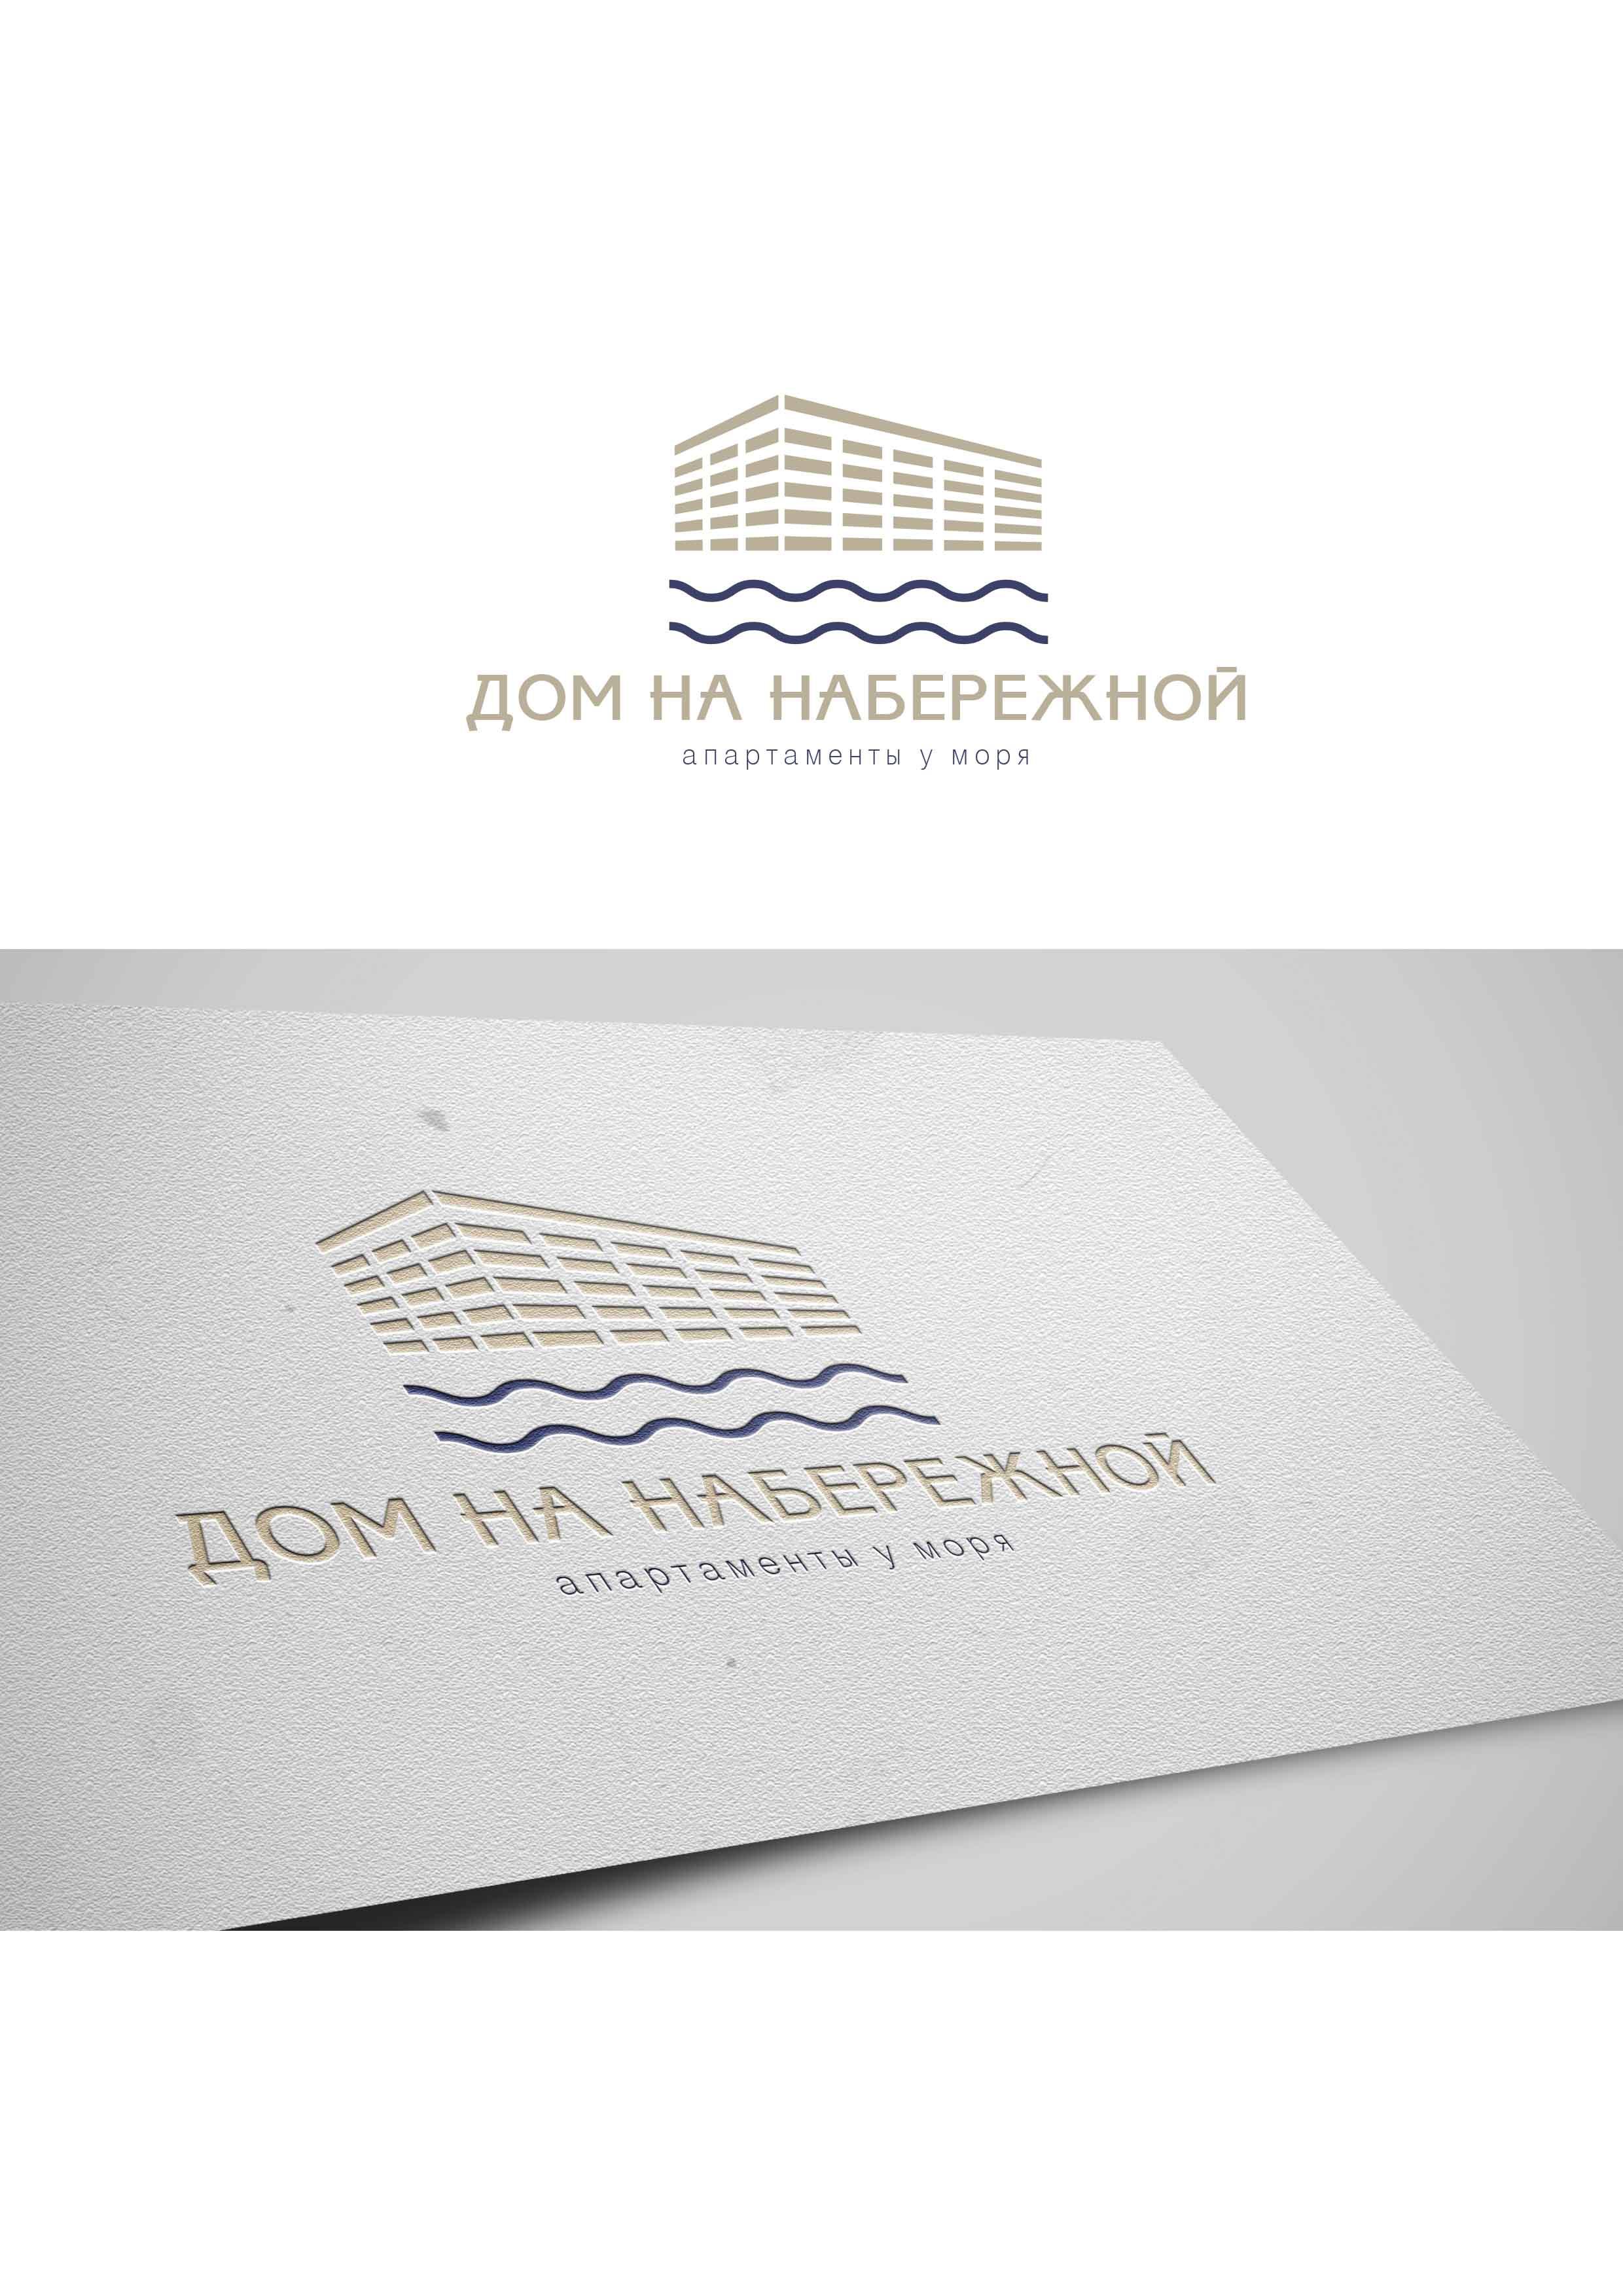 РАЗРАБОТКА логотипа для ЖИЛОГО КОМПЛЕКСА премиум В АНАПЕ.  фото f_7725dee04d2b3587.jpg